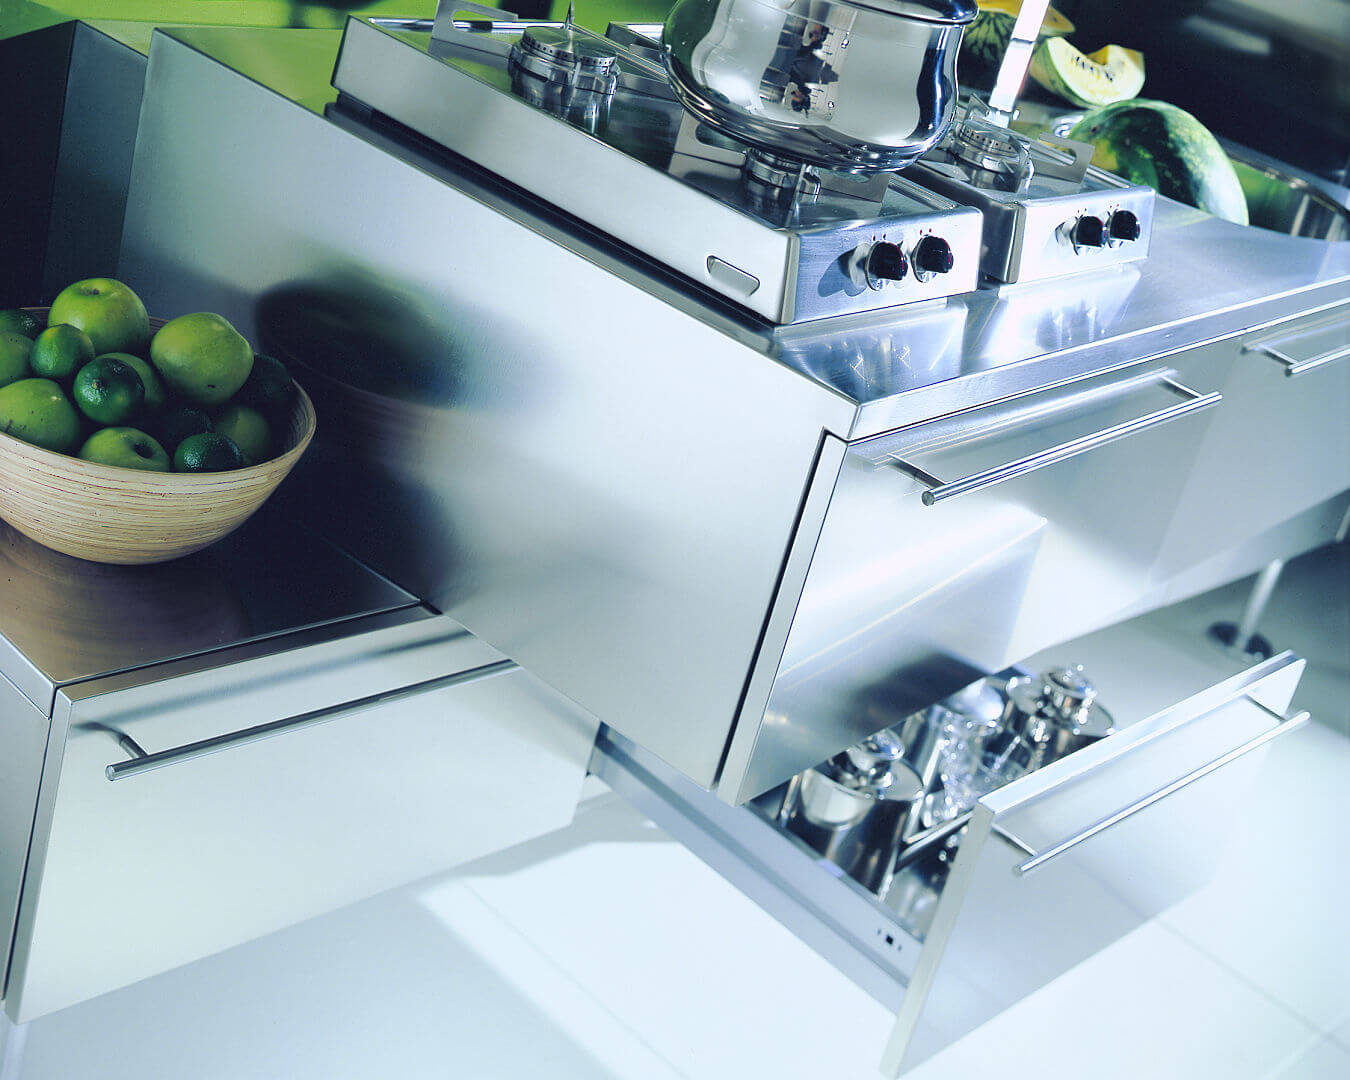 Arca Cucine Italy - Kitchen Stainless Steel Customized - Cestone